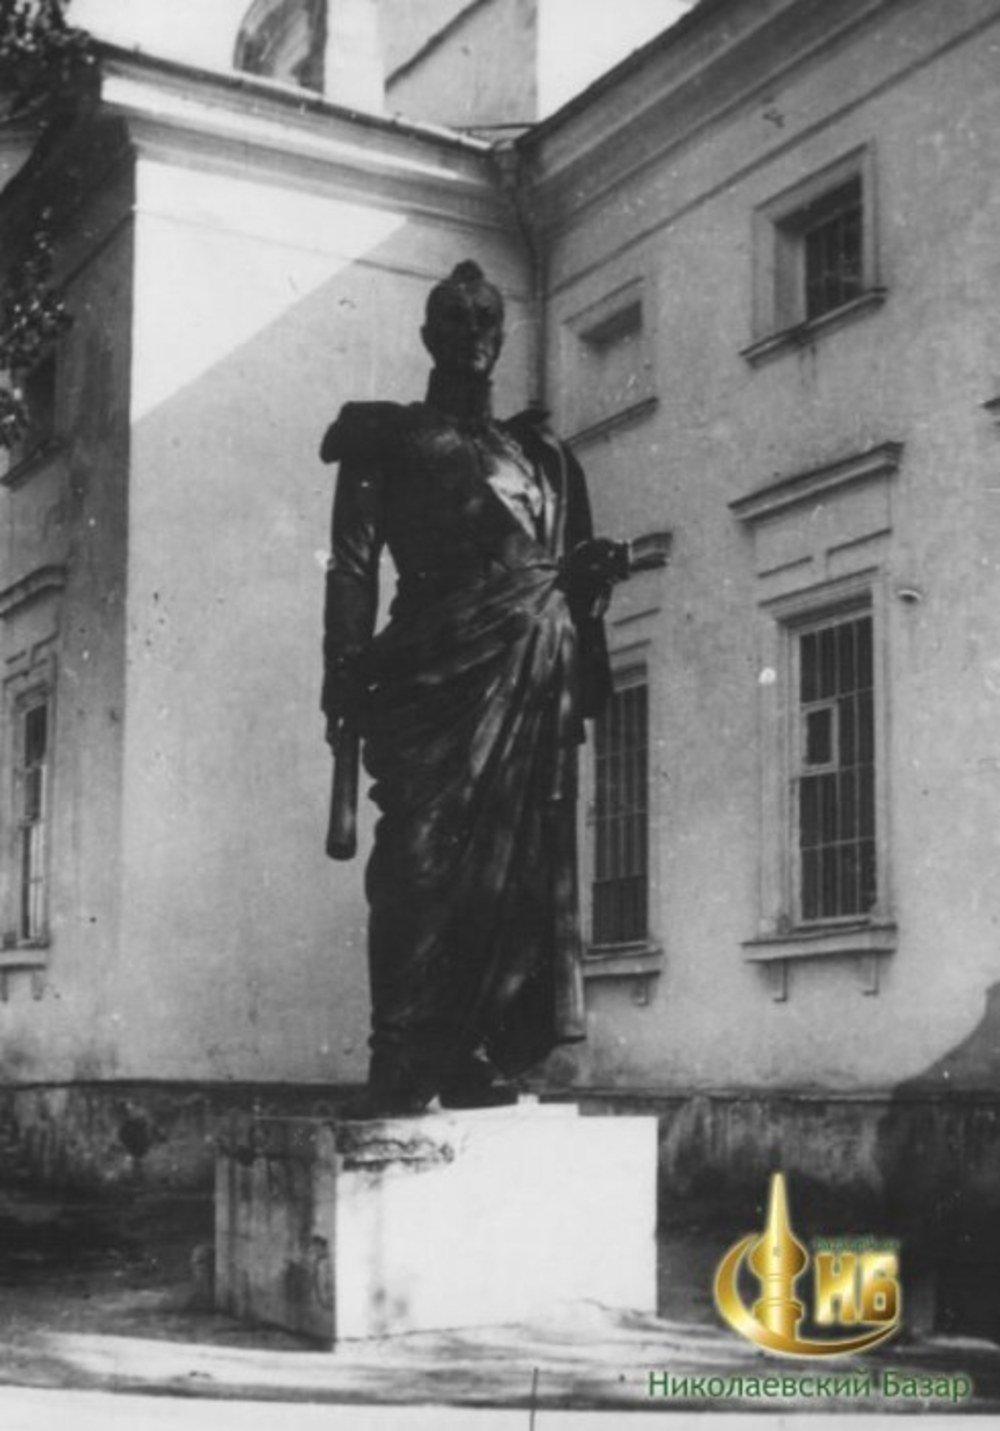 Памятник Грейгу после демонтажа